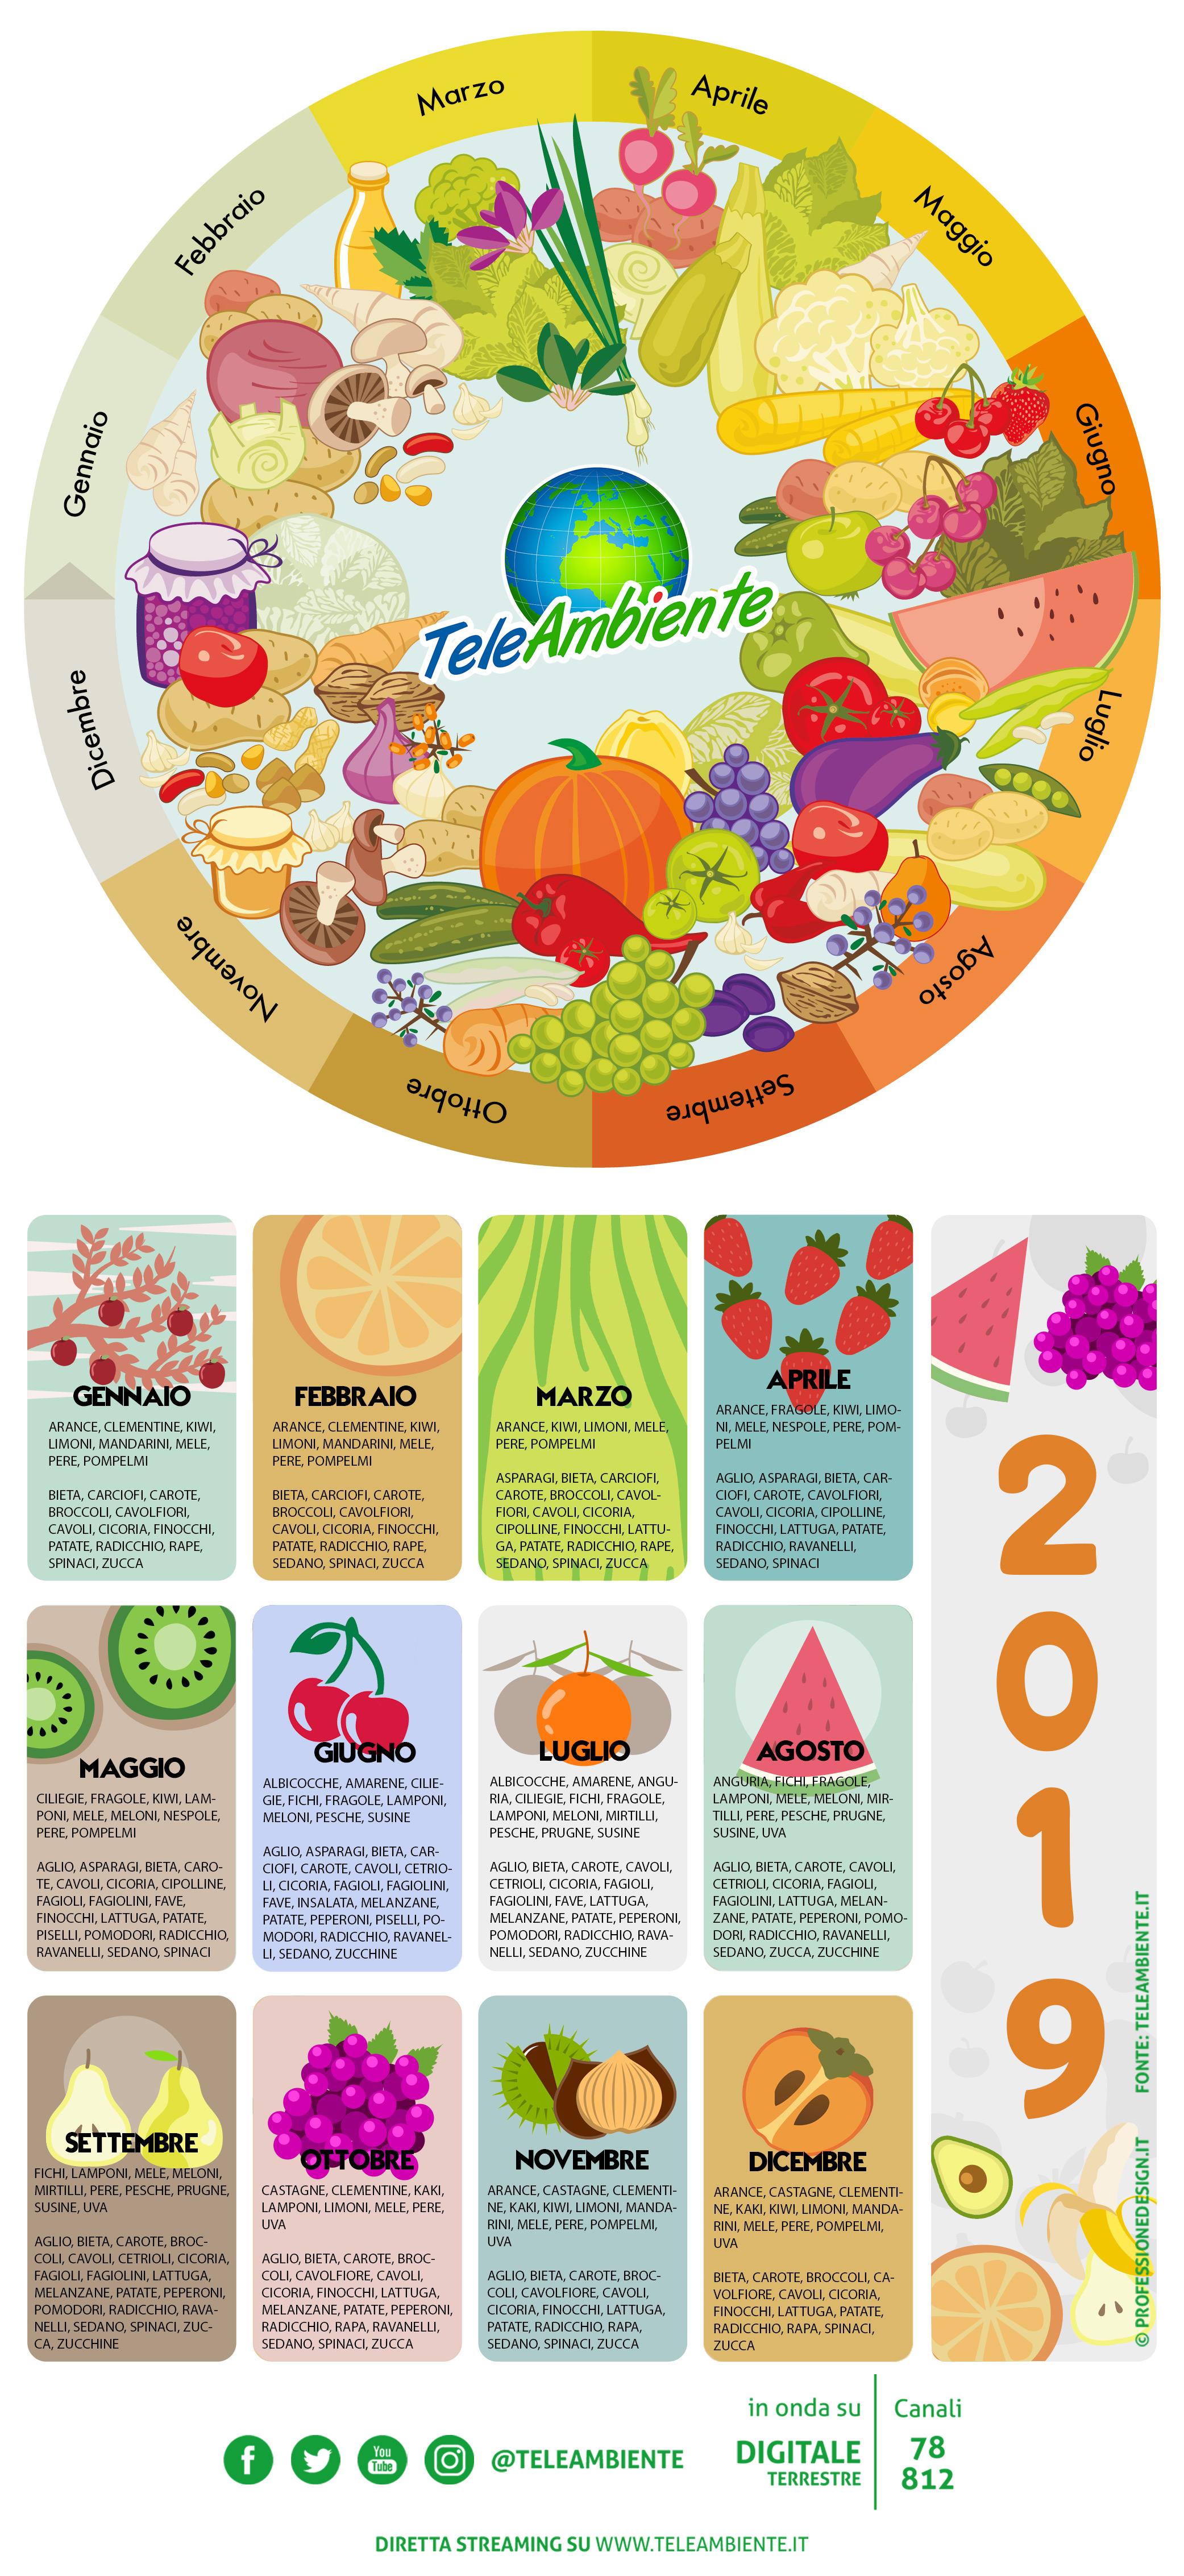 Calendario Stagionalita Frutta E Verdura.Calendario Frutta E Verdura 2019 Teleambiente Tv Canale